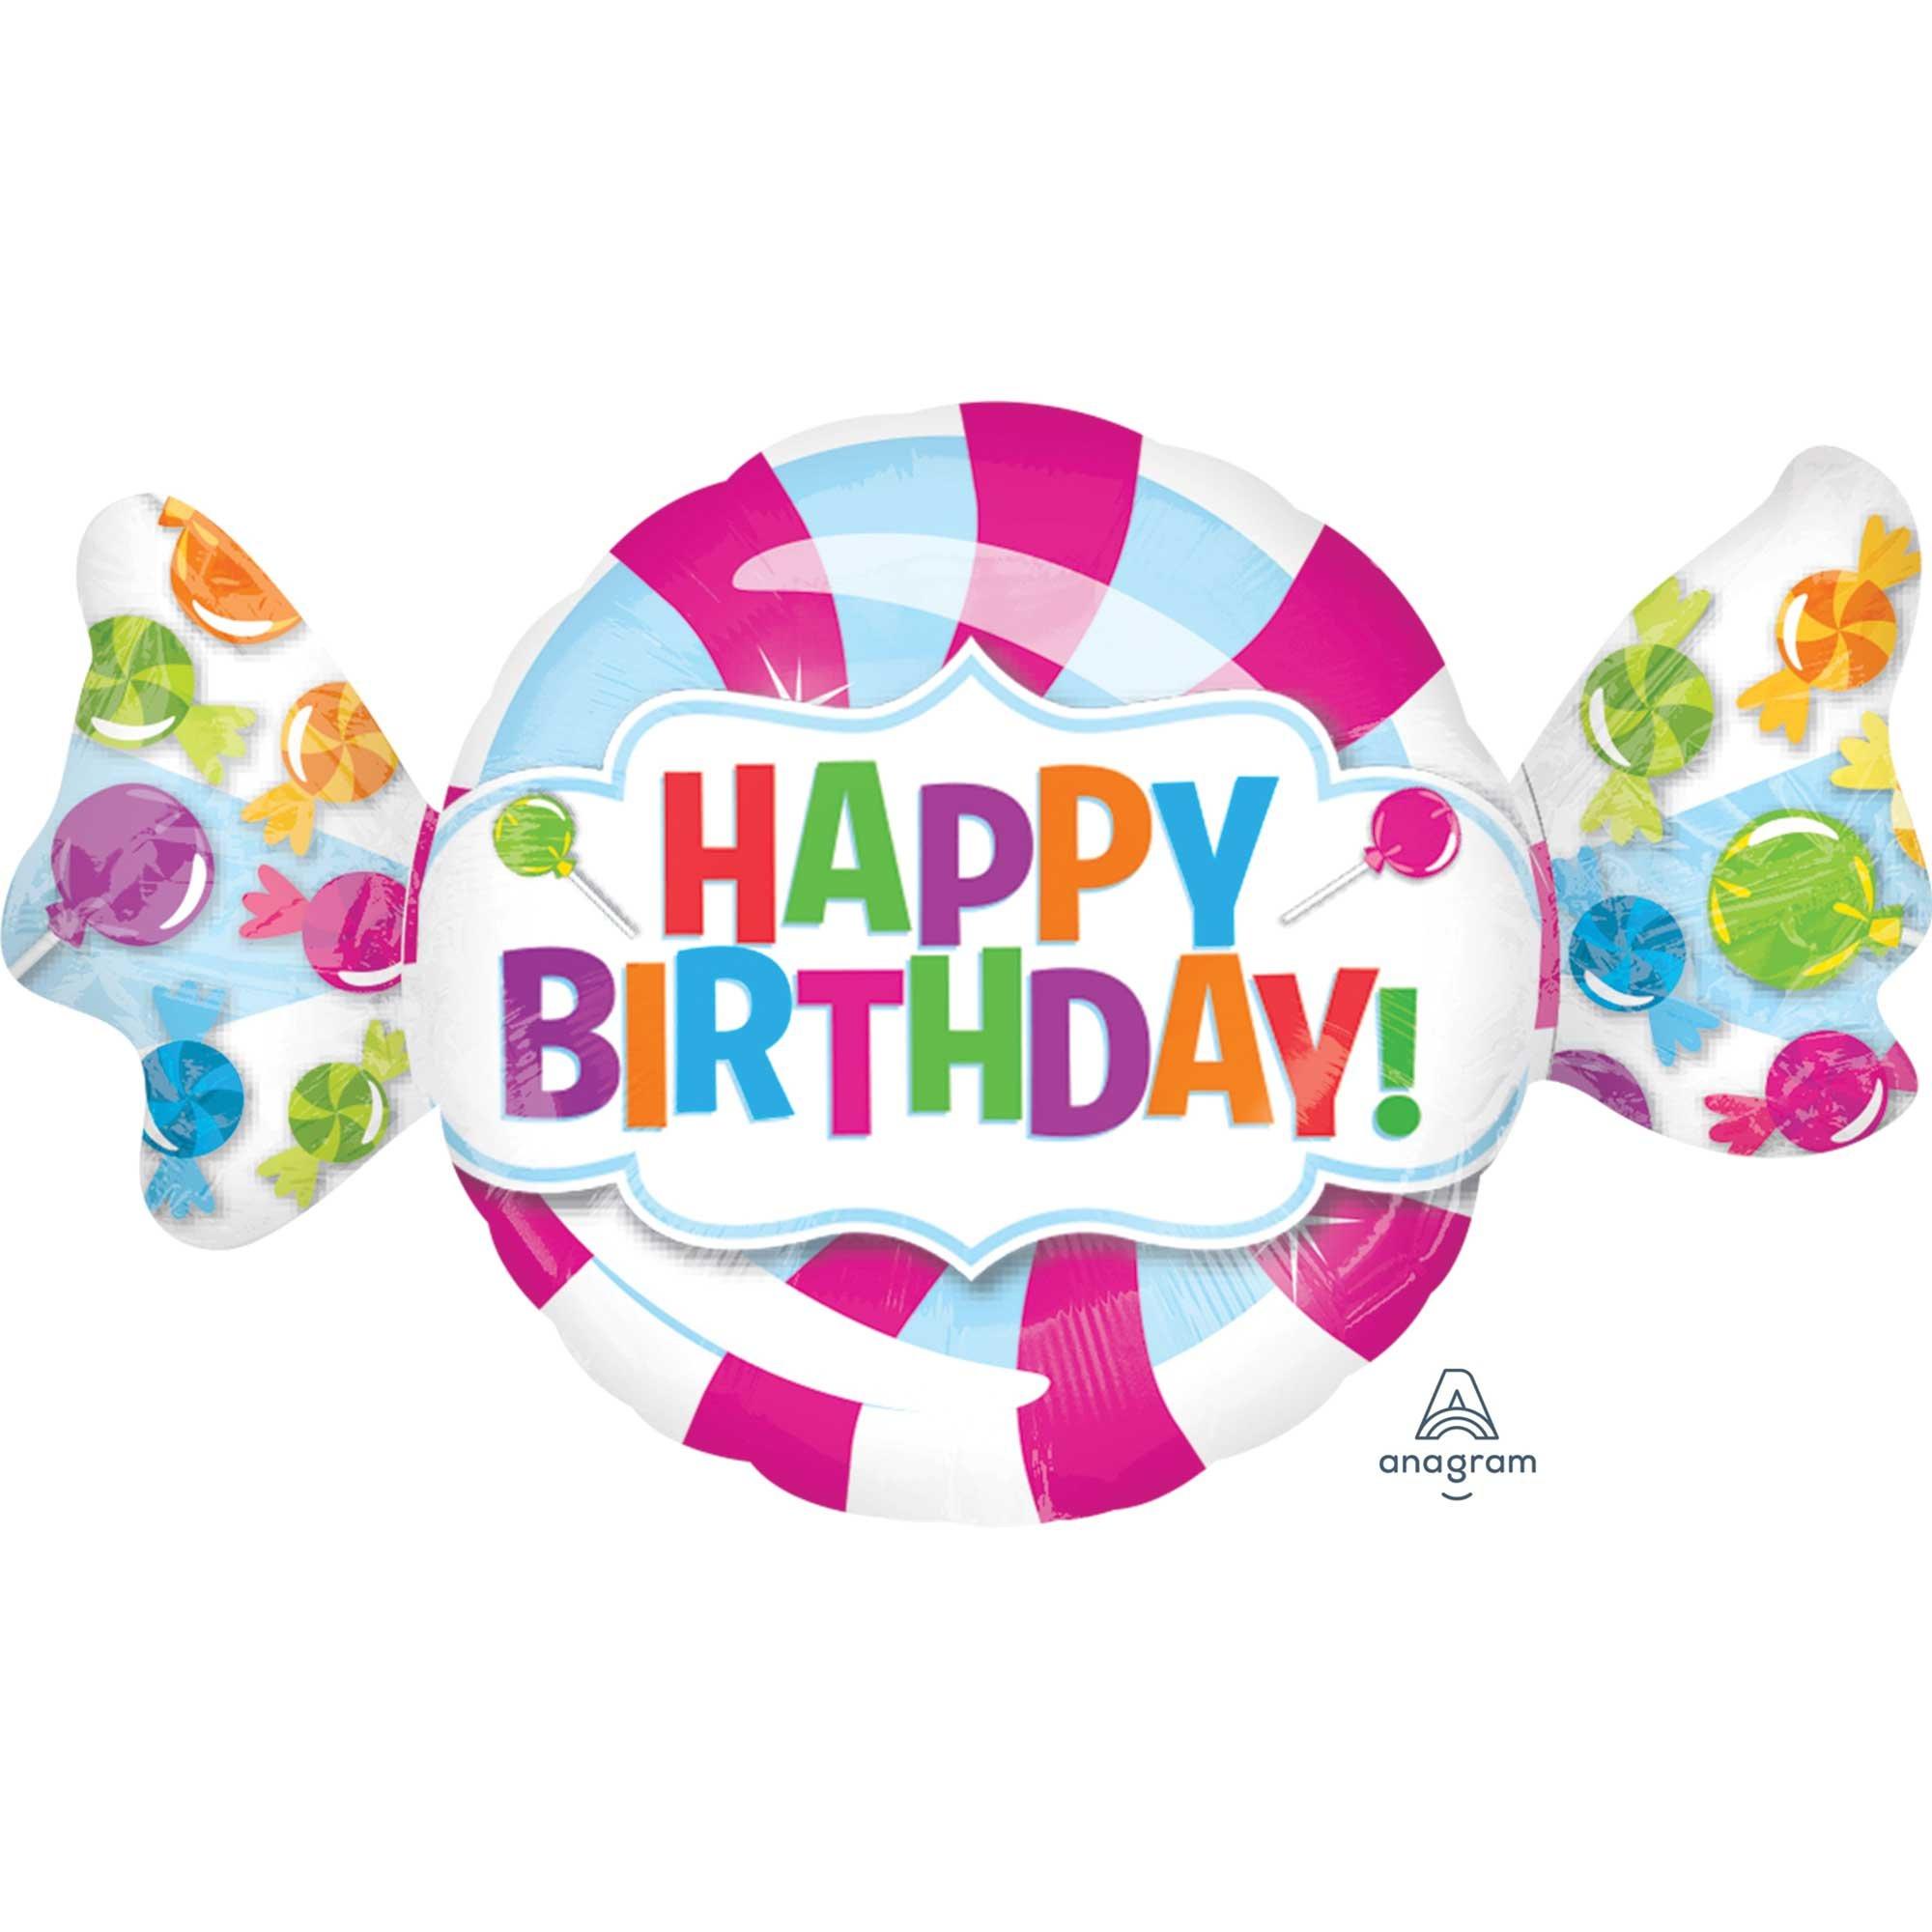 SuperShape Sweet Shop Happy Birthday P35